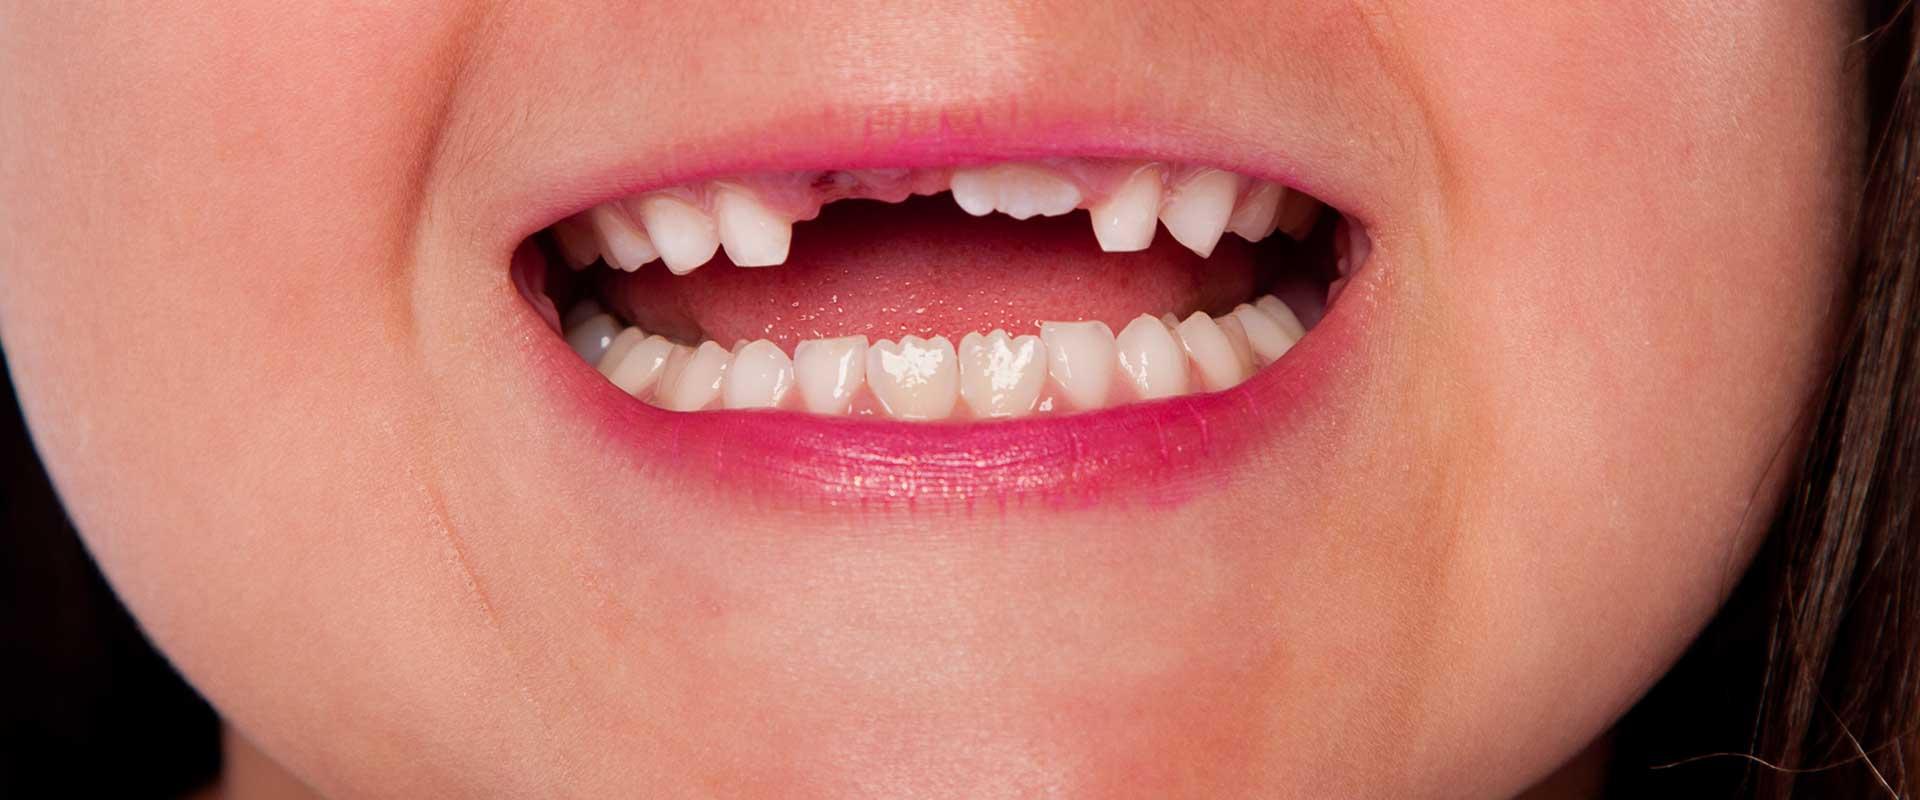 Oakridge Crossing Dental | SW Calgary Dentist | Tooth Extractions